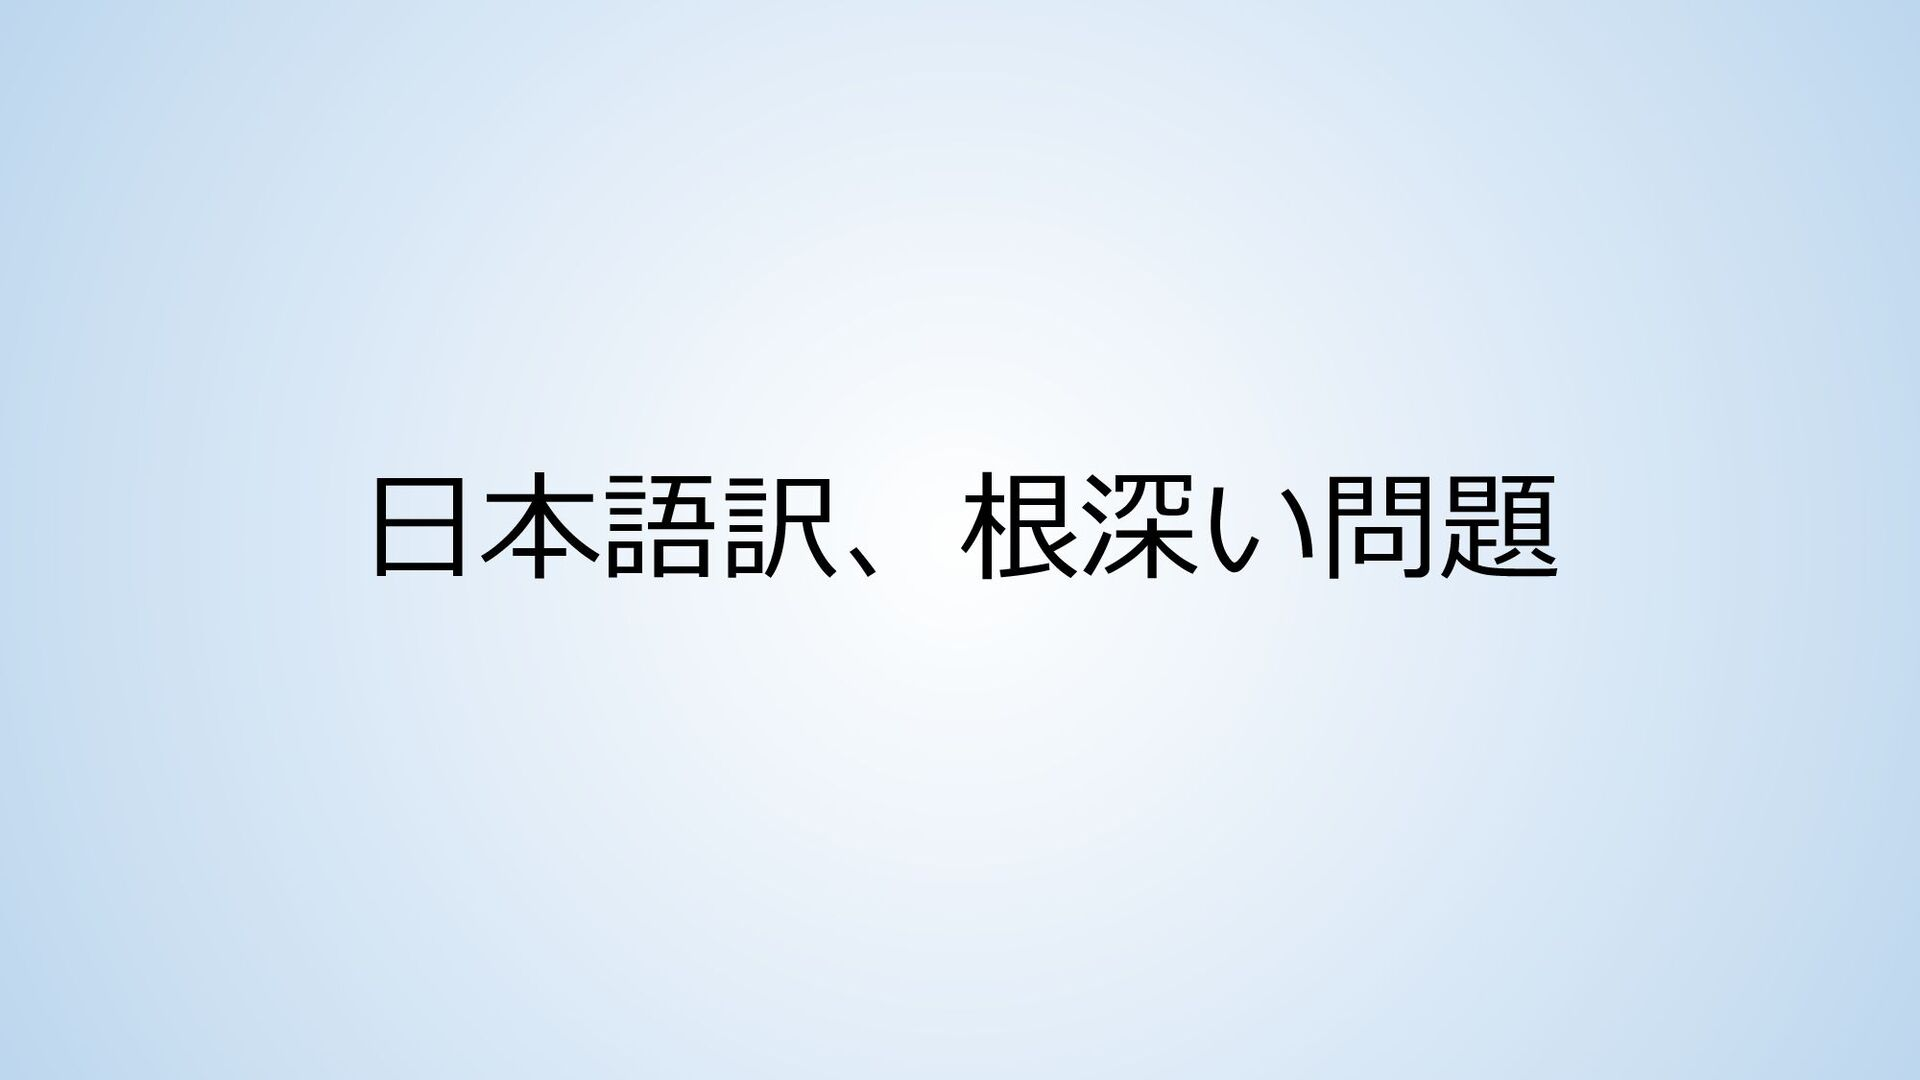 日本語訳、根深い問題